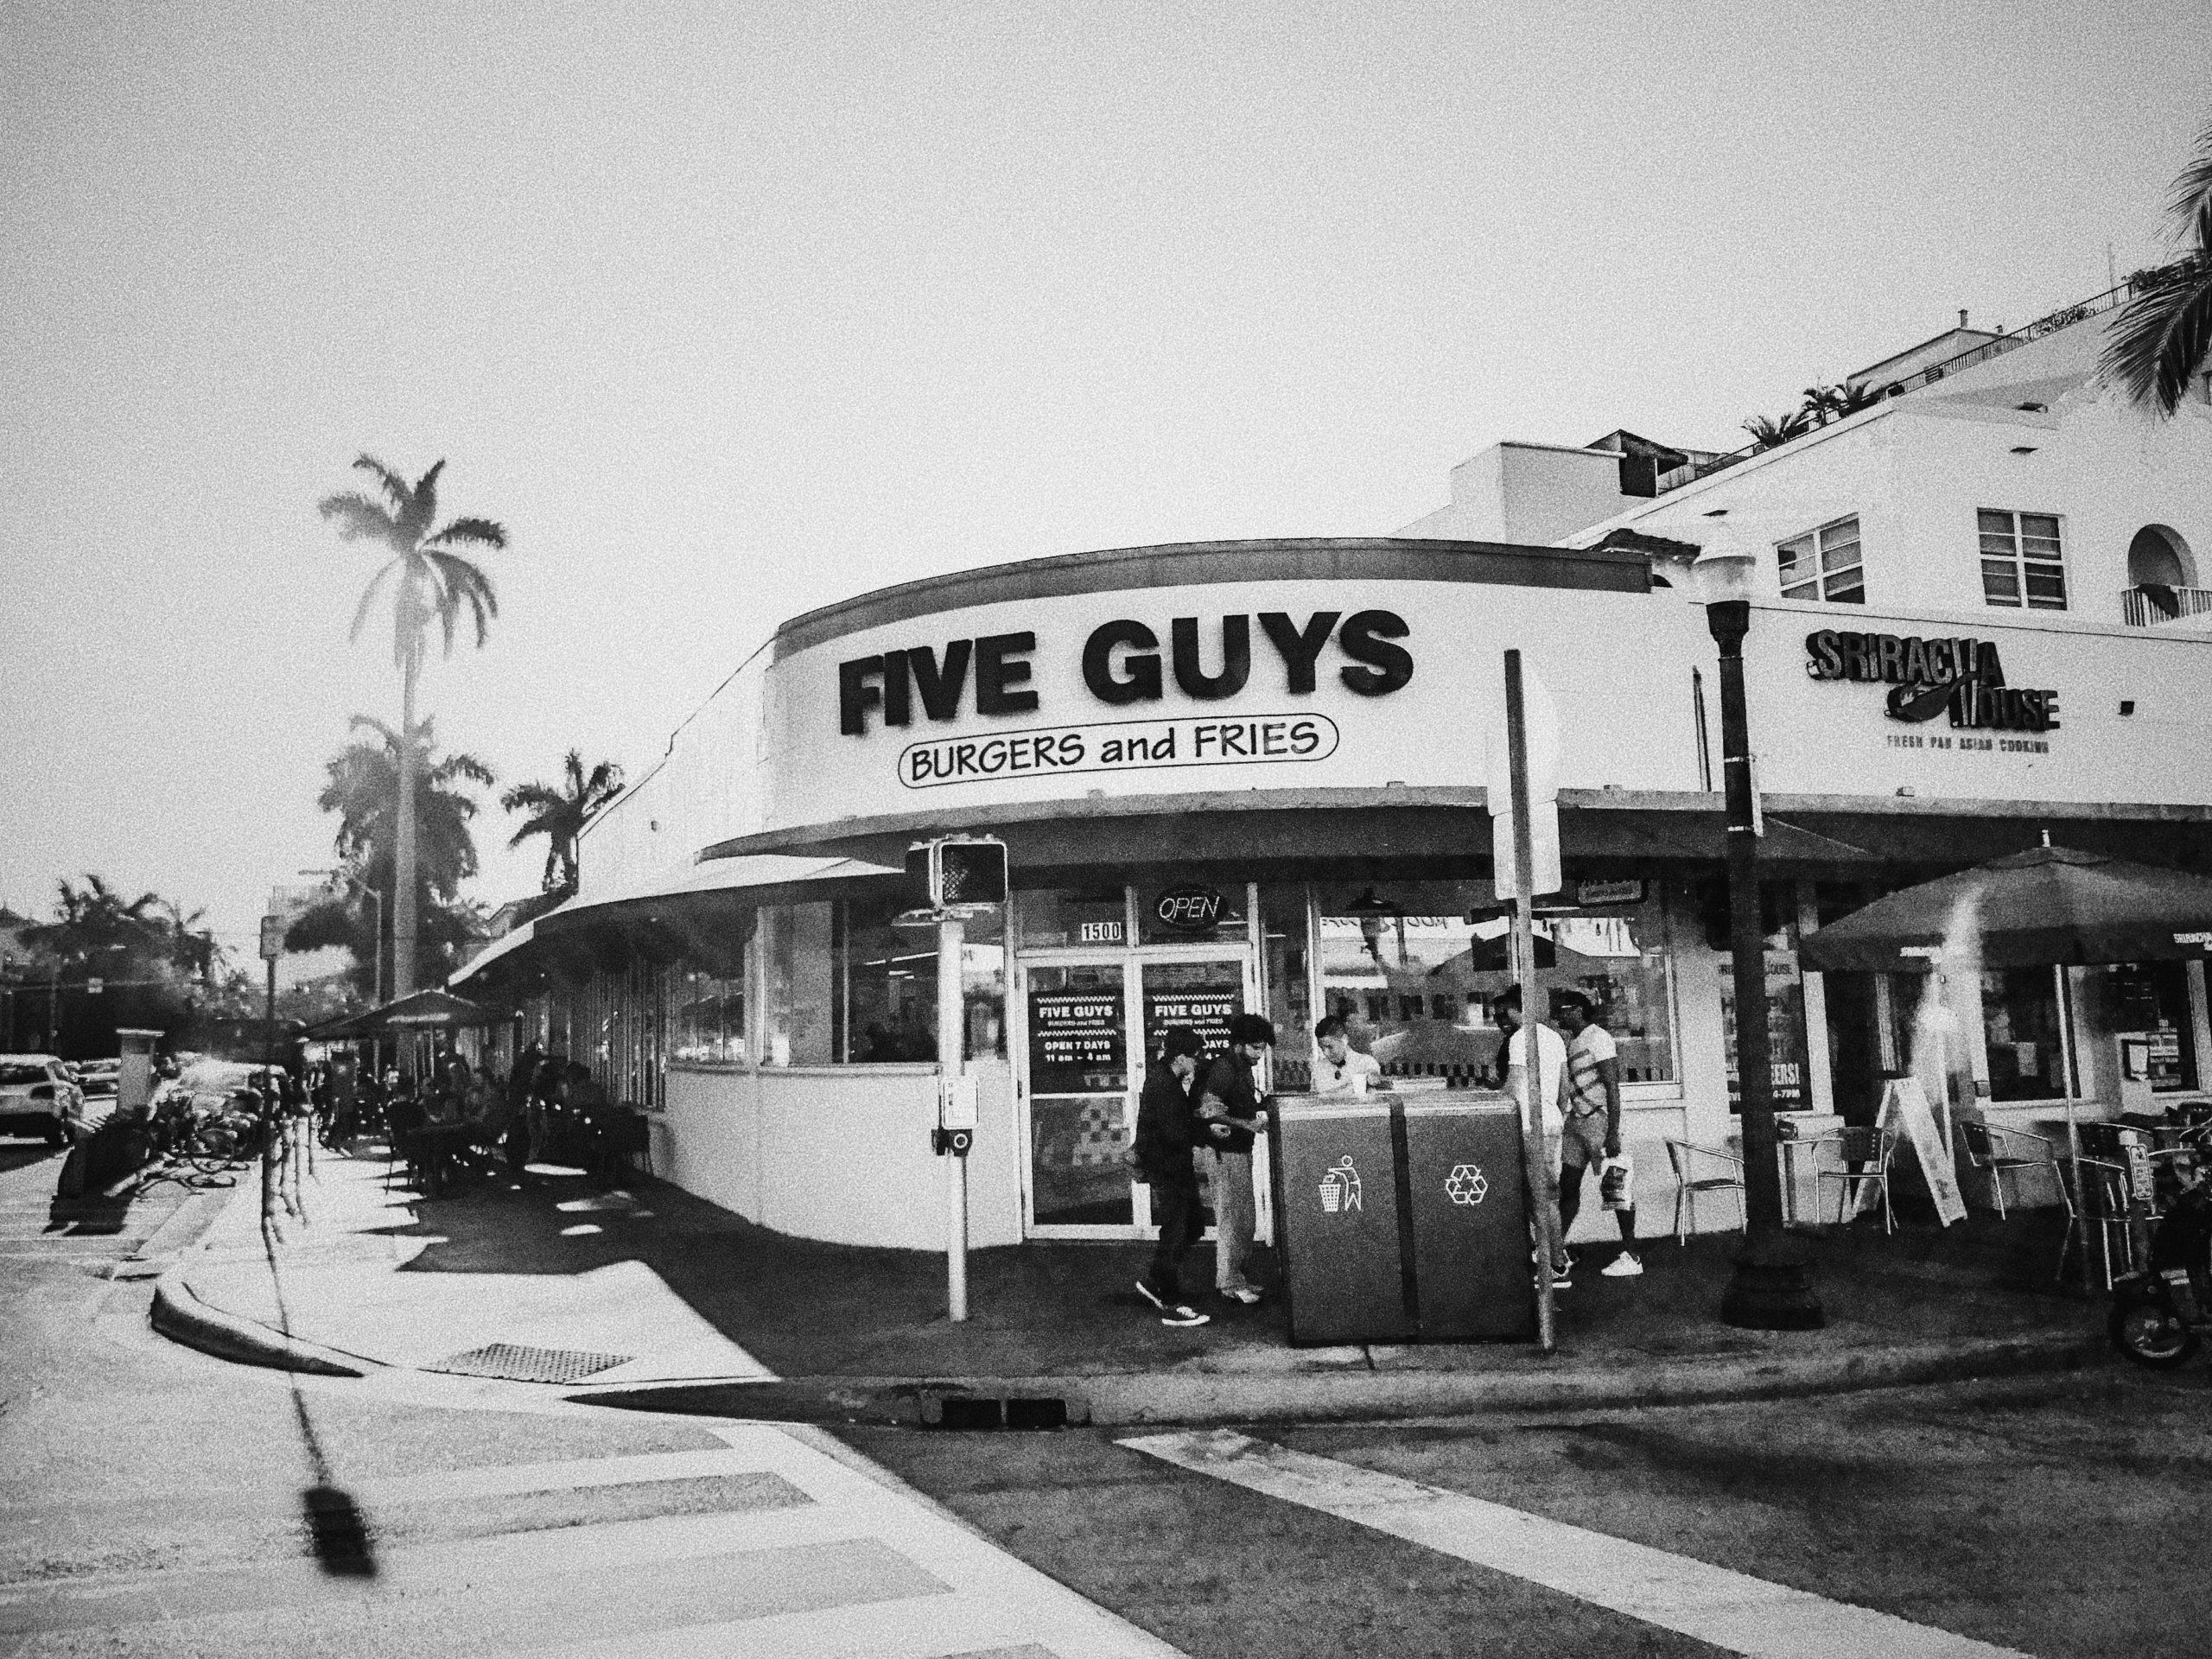 Five Guys in South Beach, Miami, Florida, USA